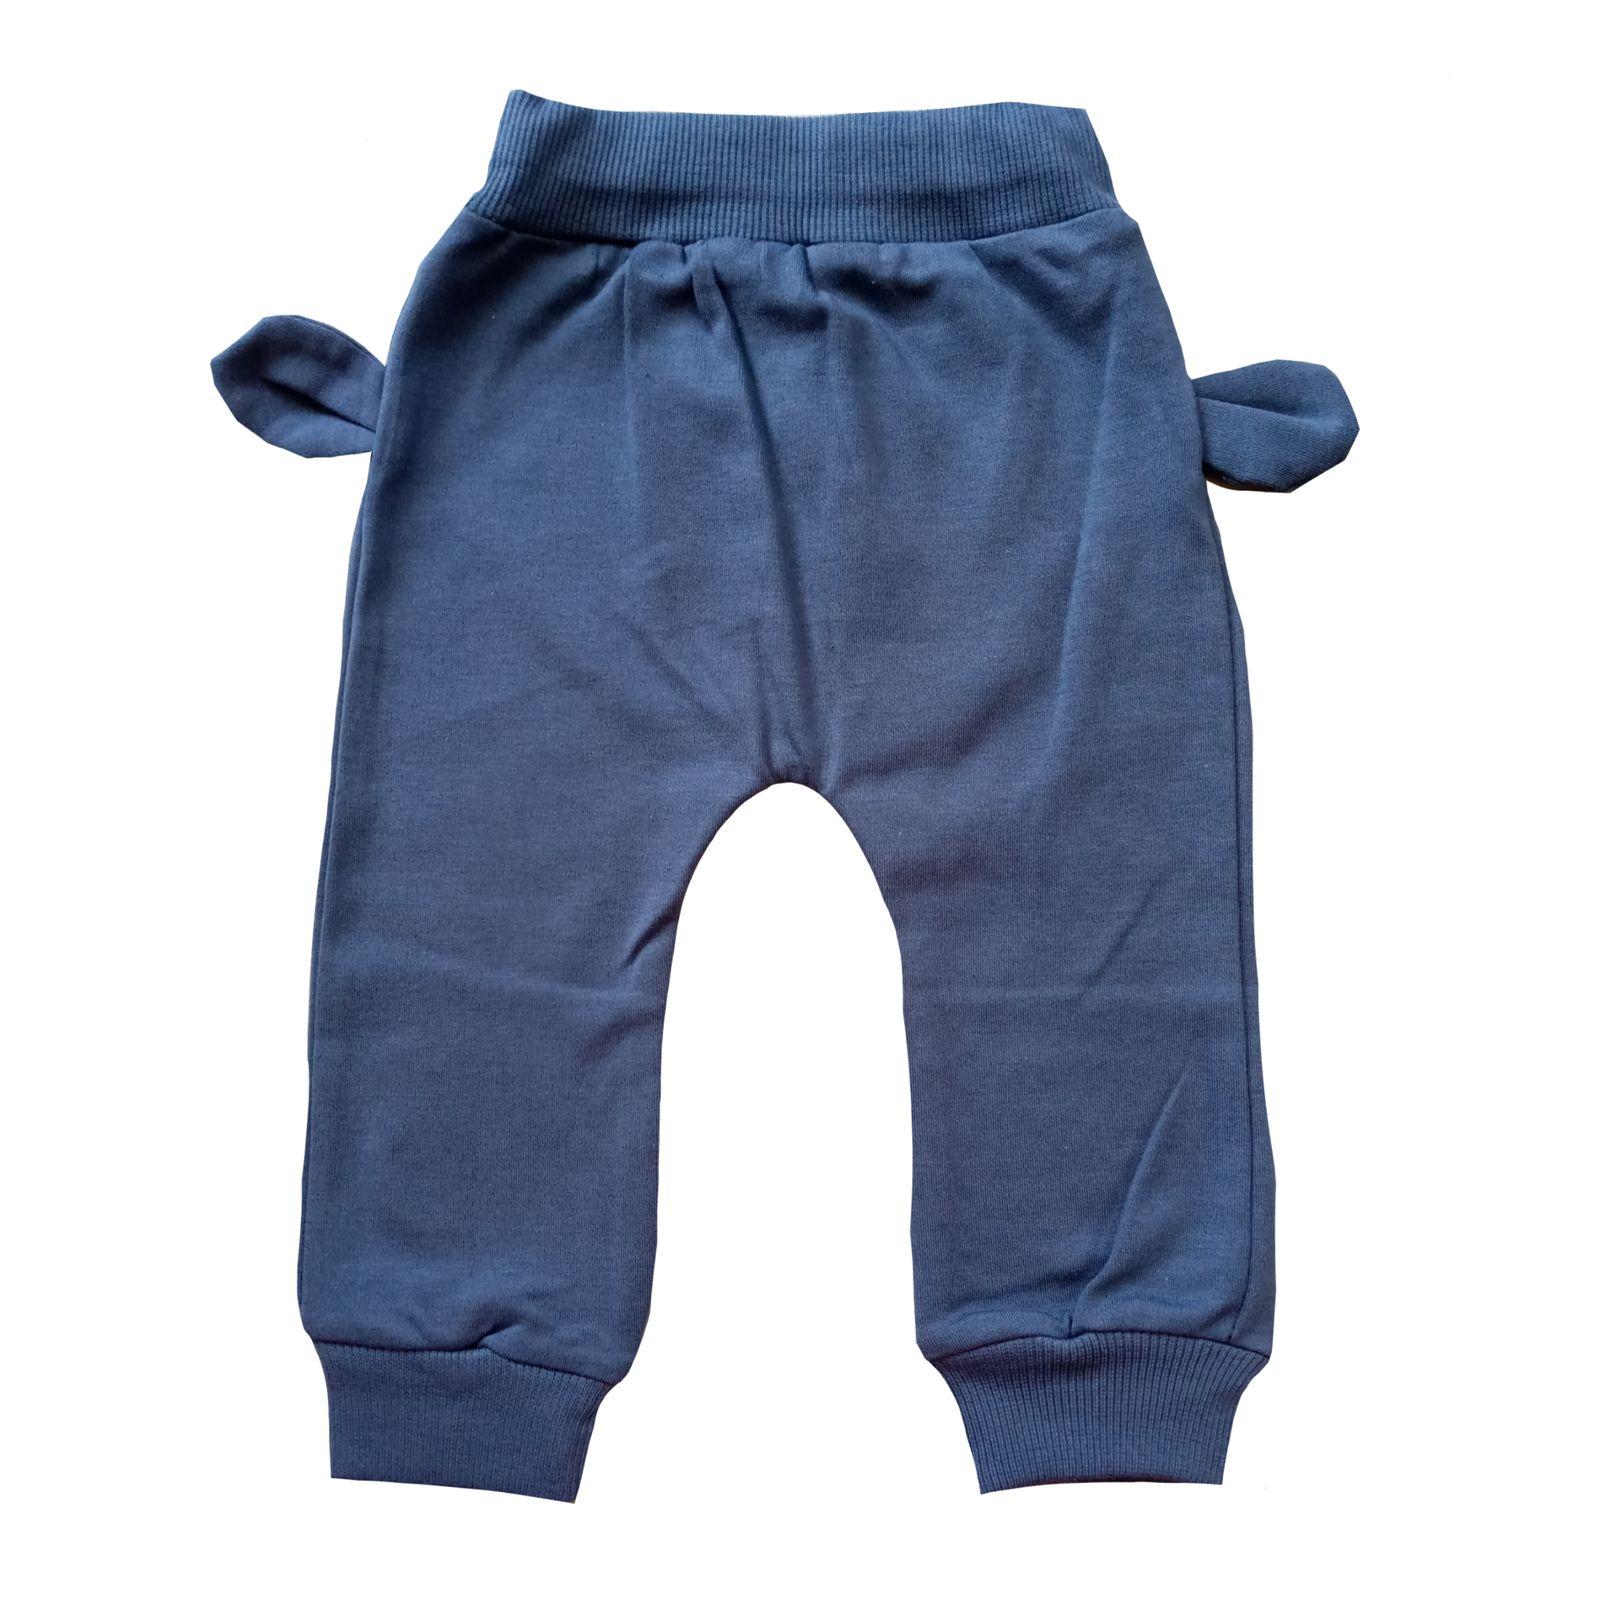 ست تیشرت و شلوار نوزادی کد 401 -  - 5